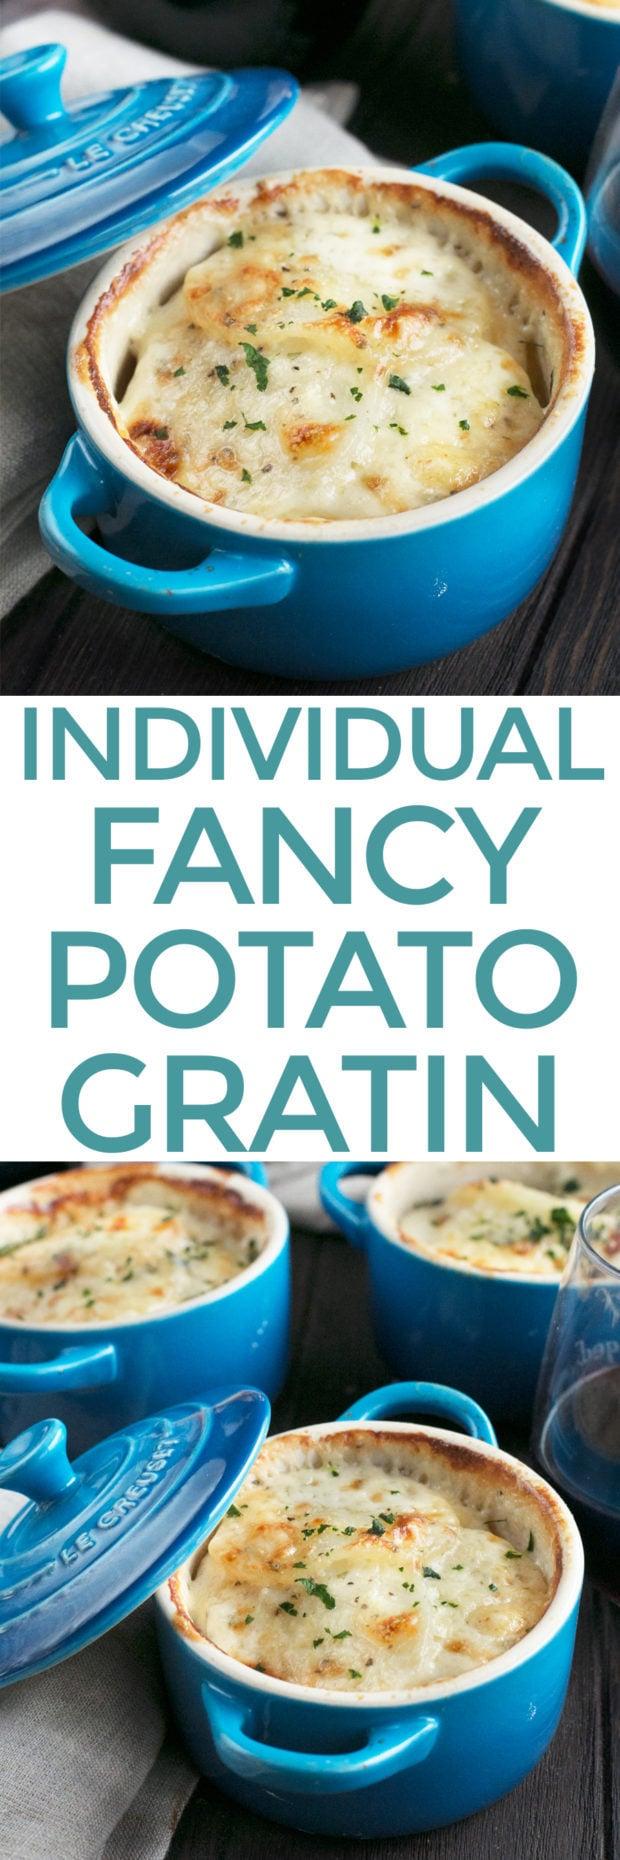 Cheesy Herb Individual Potato Gratin | cakenknife.com #potatoes #sidedish #hoildays #thanksgiving